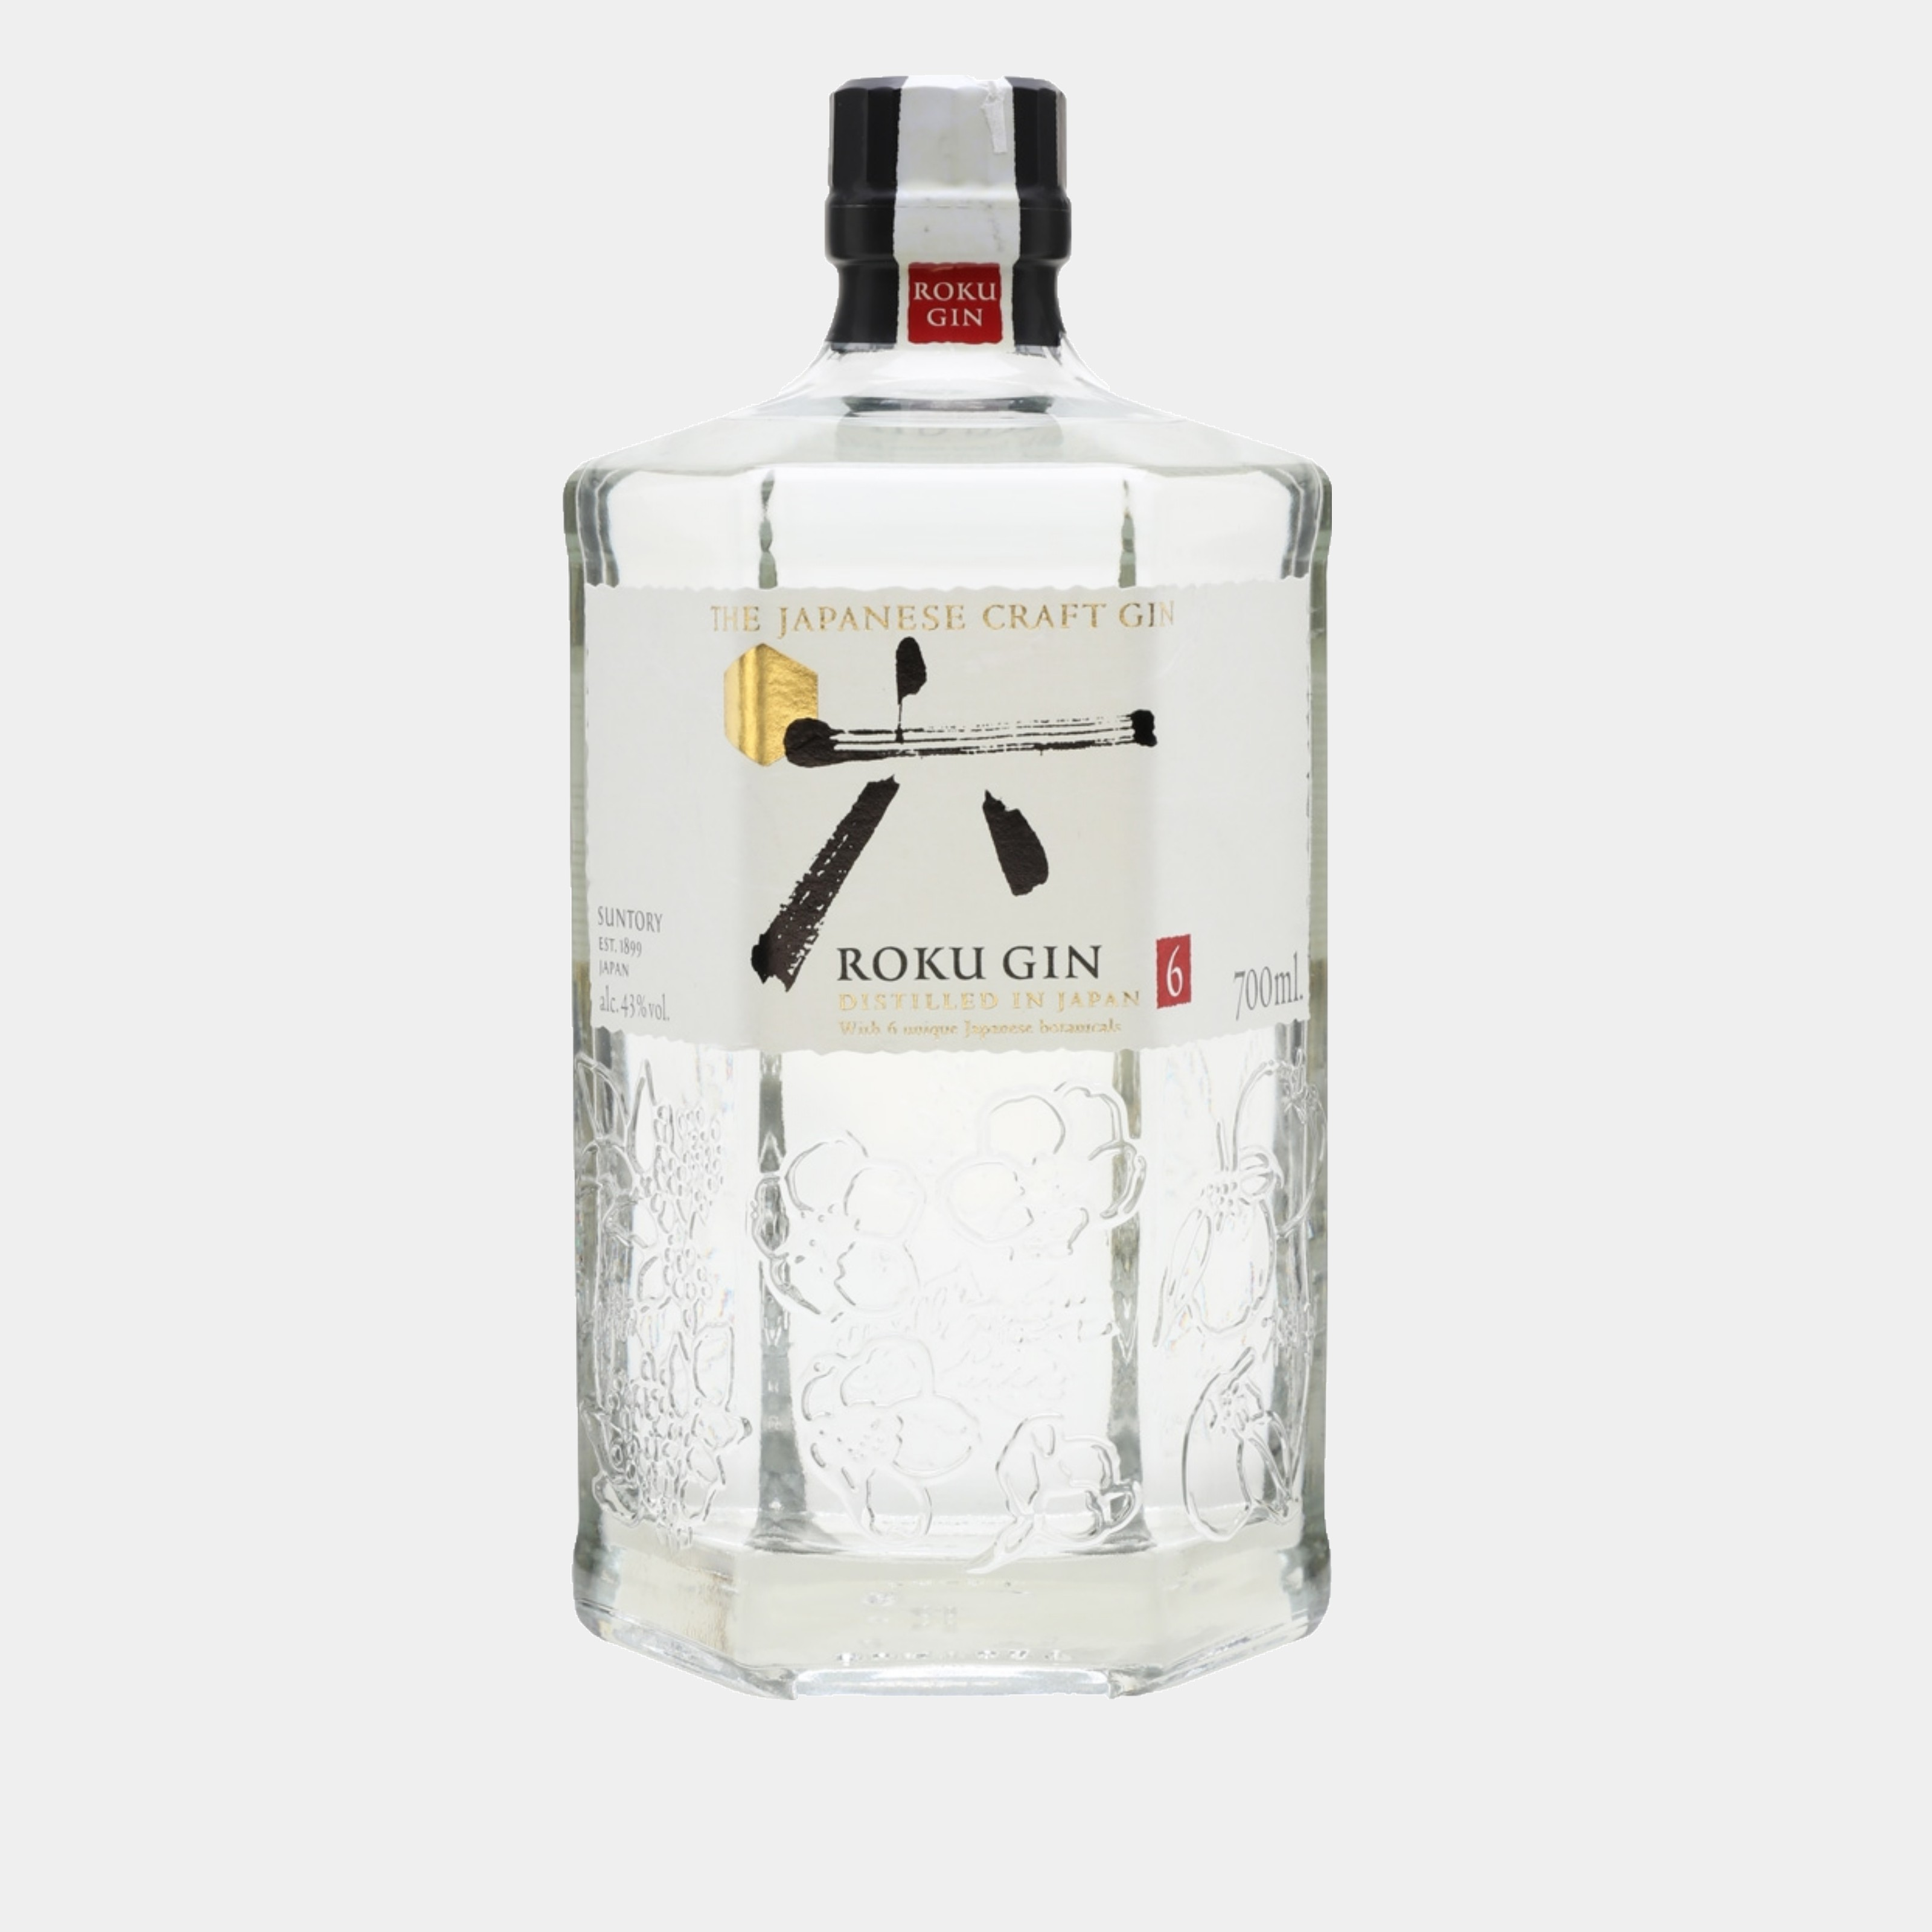 Roku Gin 0.7l 43% Alk.